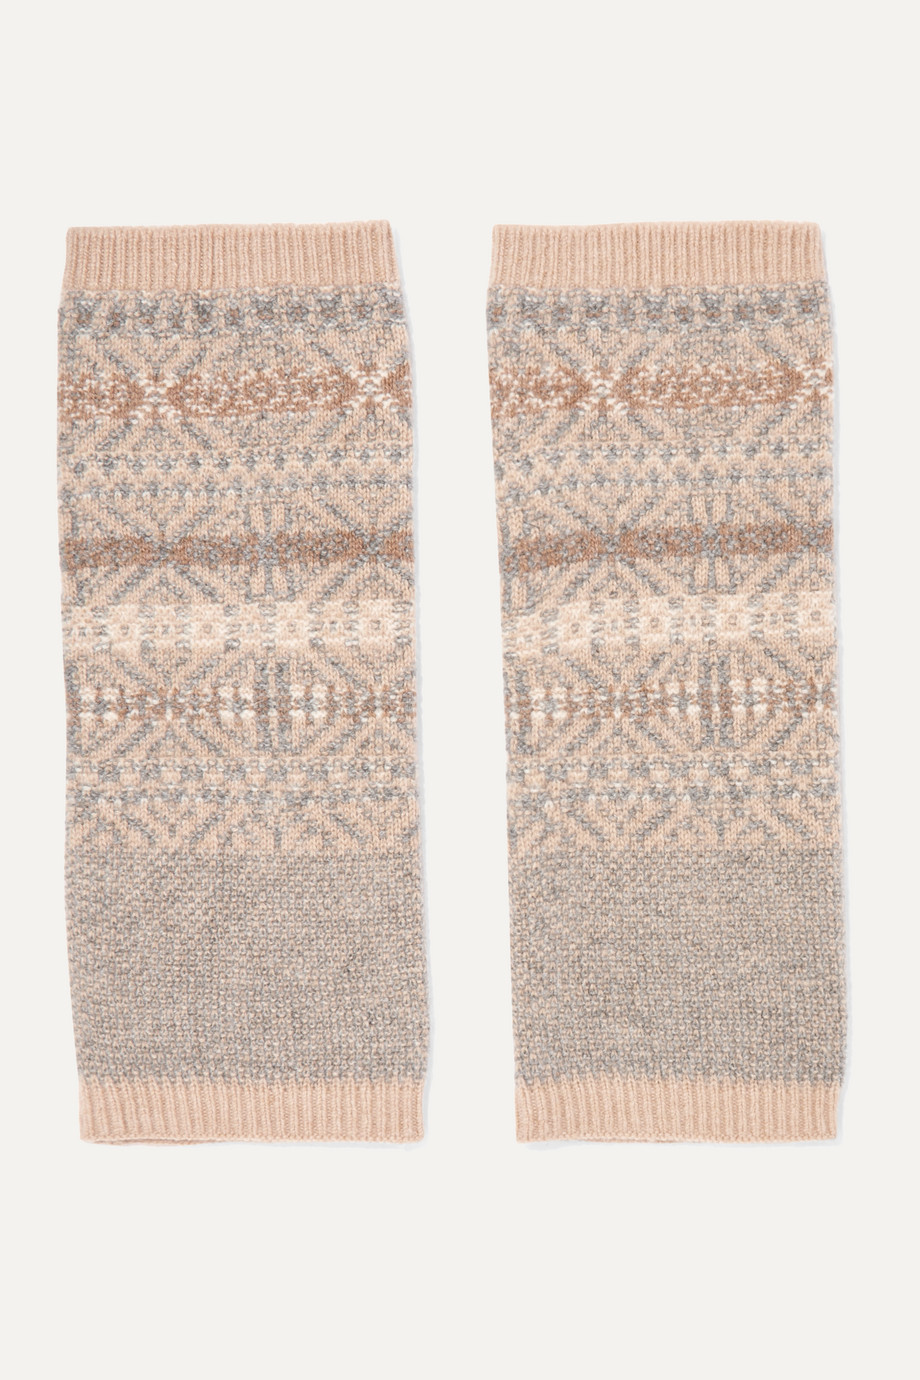 Loro Piana 费尔岛式杂色图案针织羊绒袜套